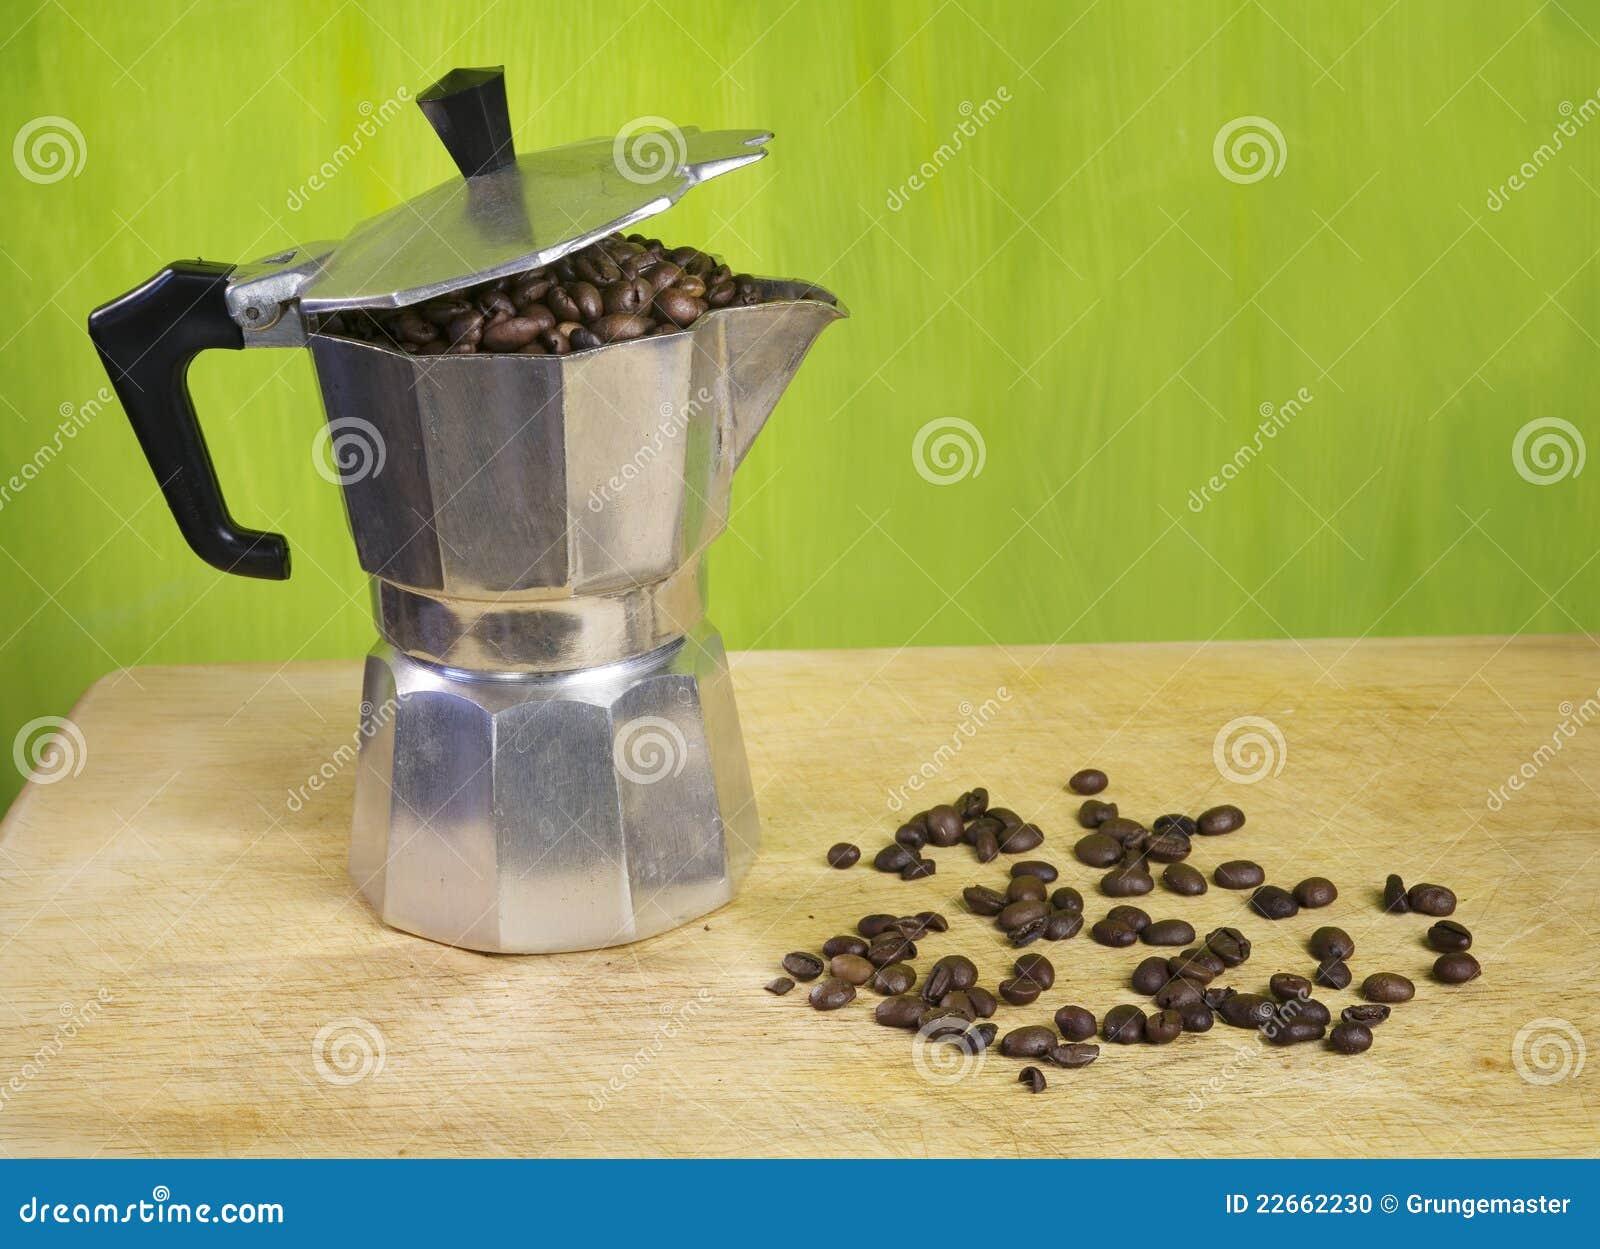 Italian Coffee Maker Stock Photo - Image: 22662230